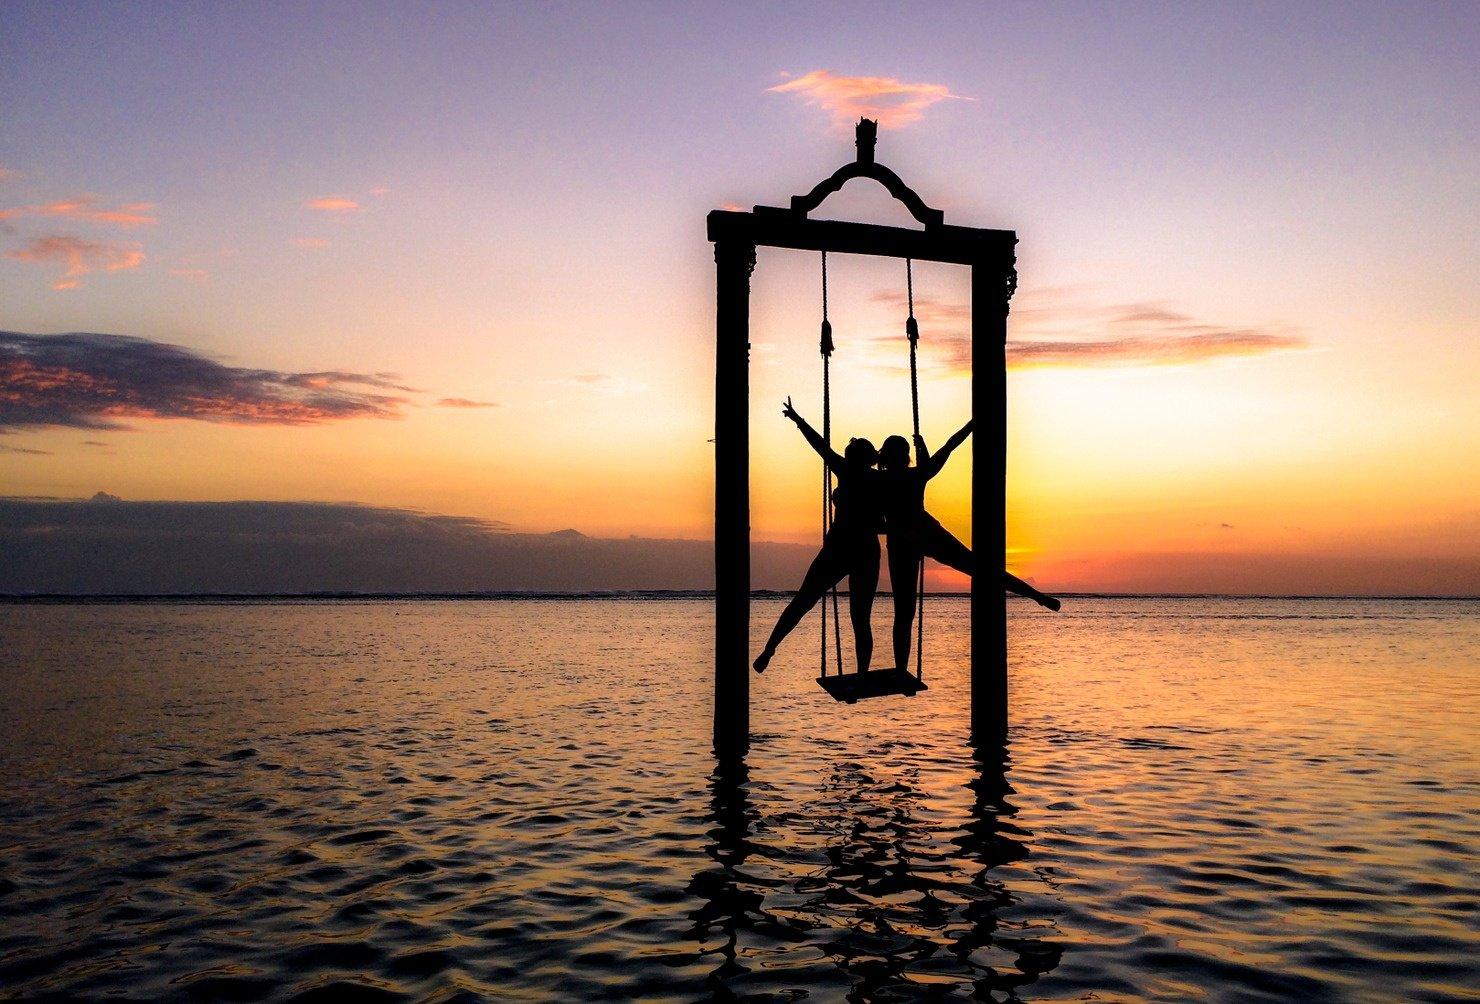 Bali Beaches Amp Paid Work In Australia Real Gap Experience